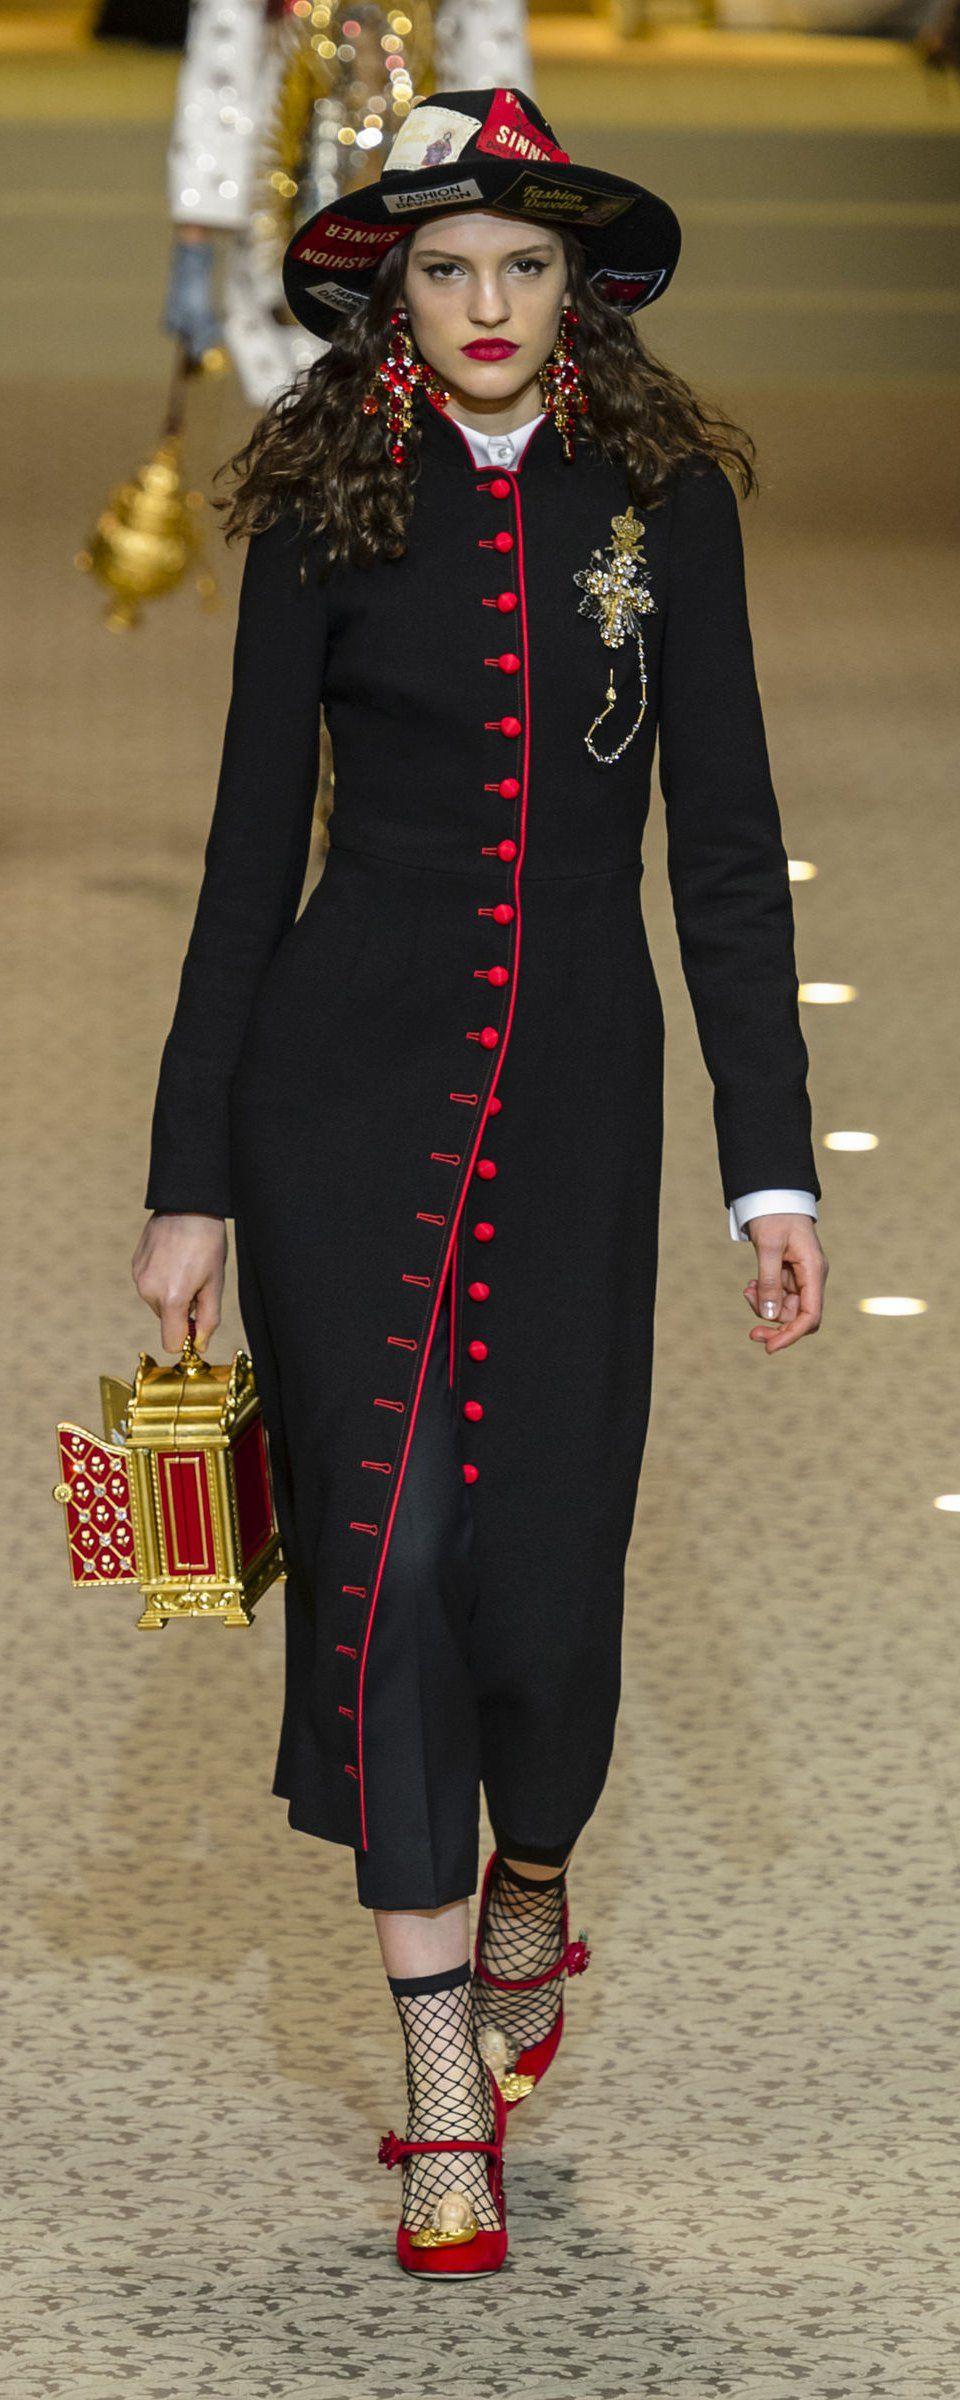 Mode Passe, Mode Italienne, Costume Femme, Prêt À Porter, Stylisme, Manteau